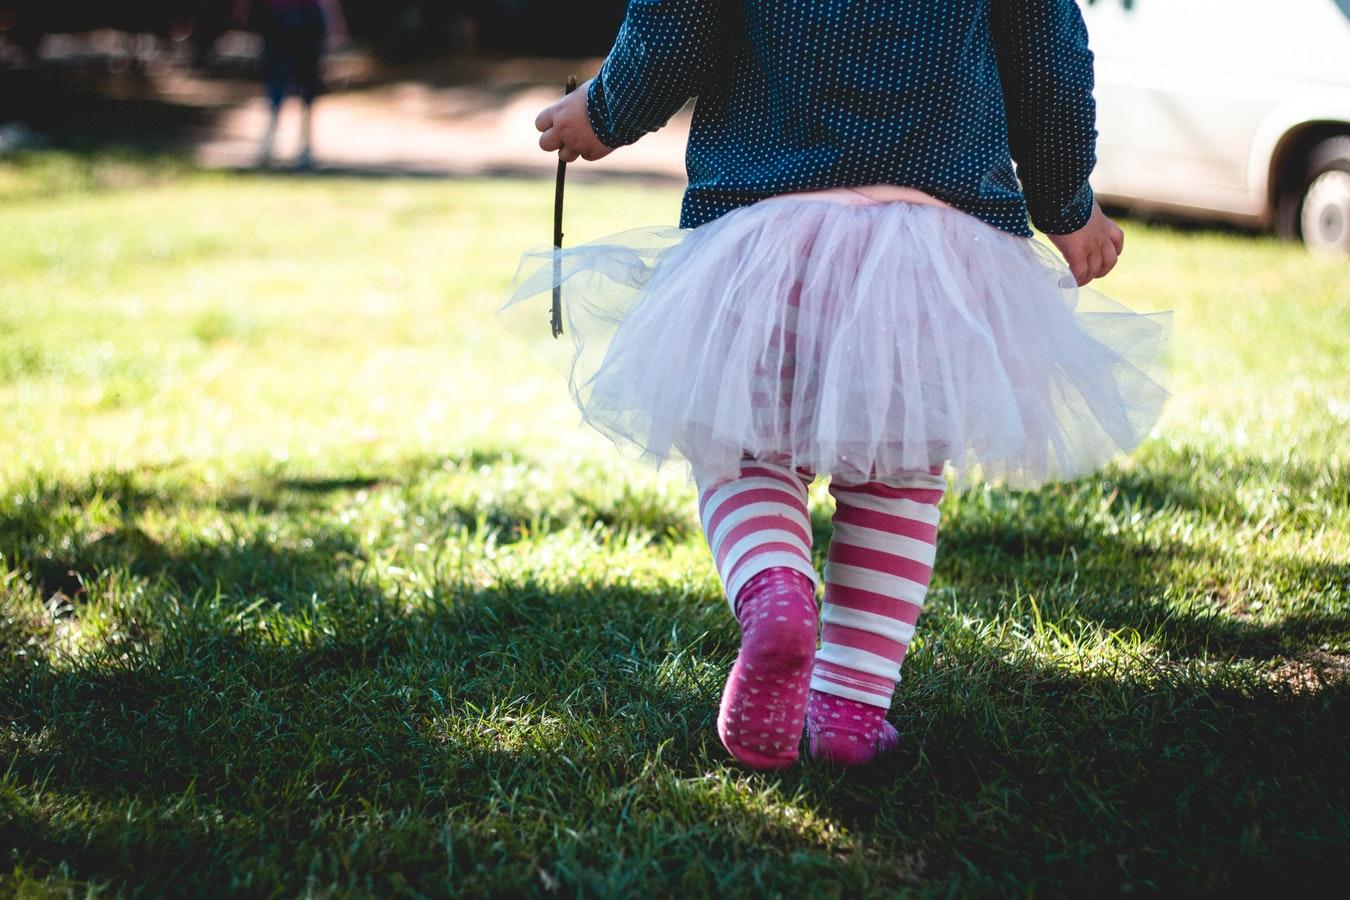 Prinsessenfeestje voor kleine meisjes verjaardag